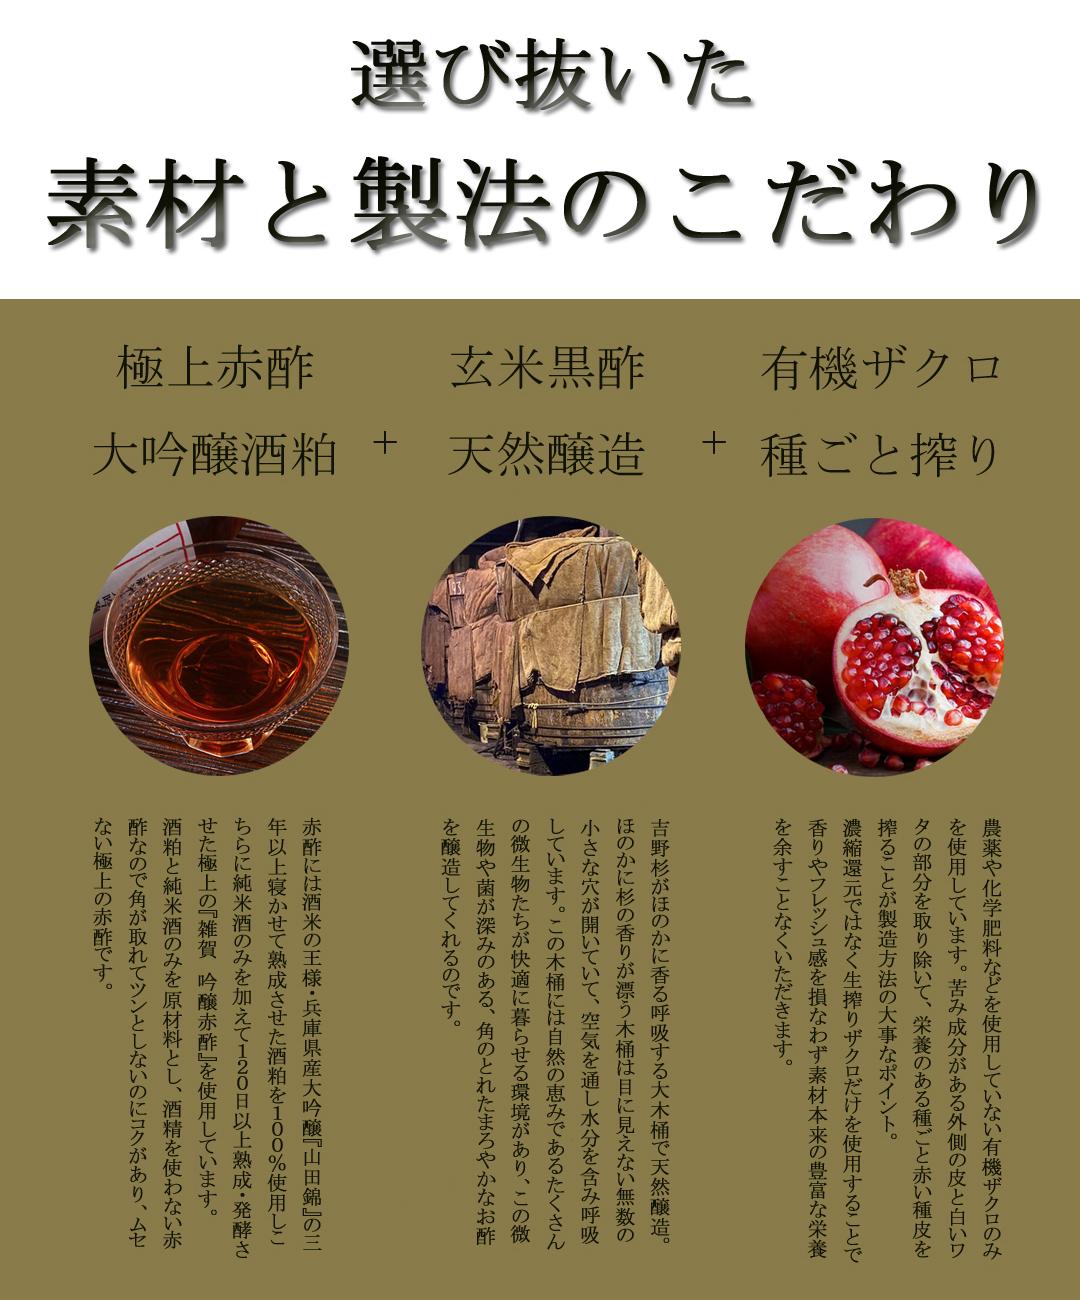 Micoas飲む、コ酢メ。ザクロ